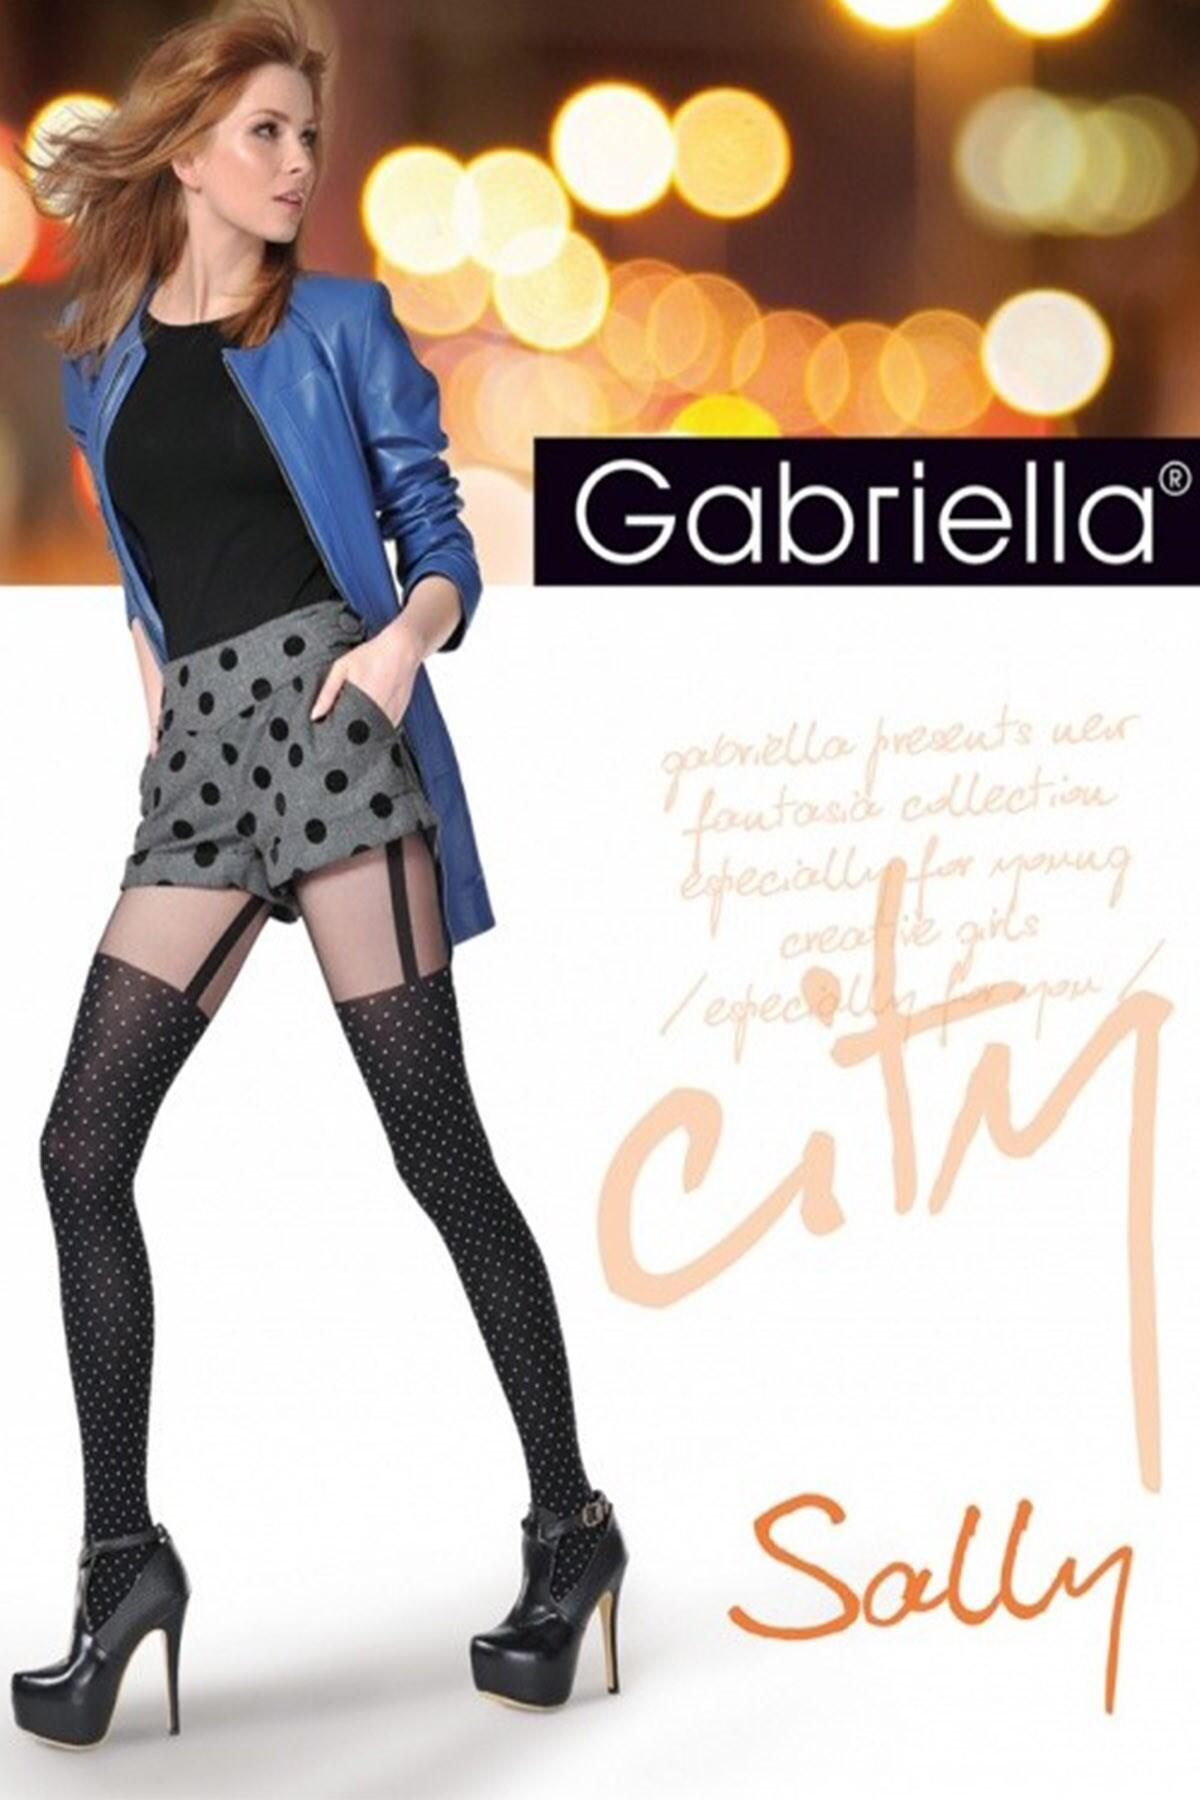 Gabriella City Sally Tights  - Black Spot